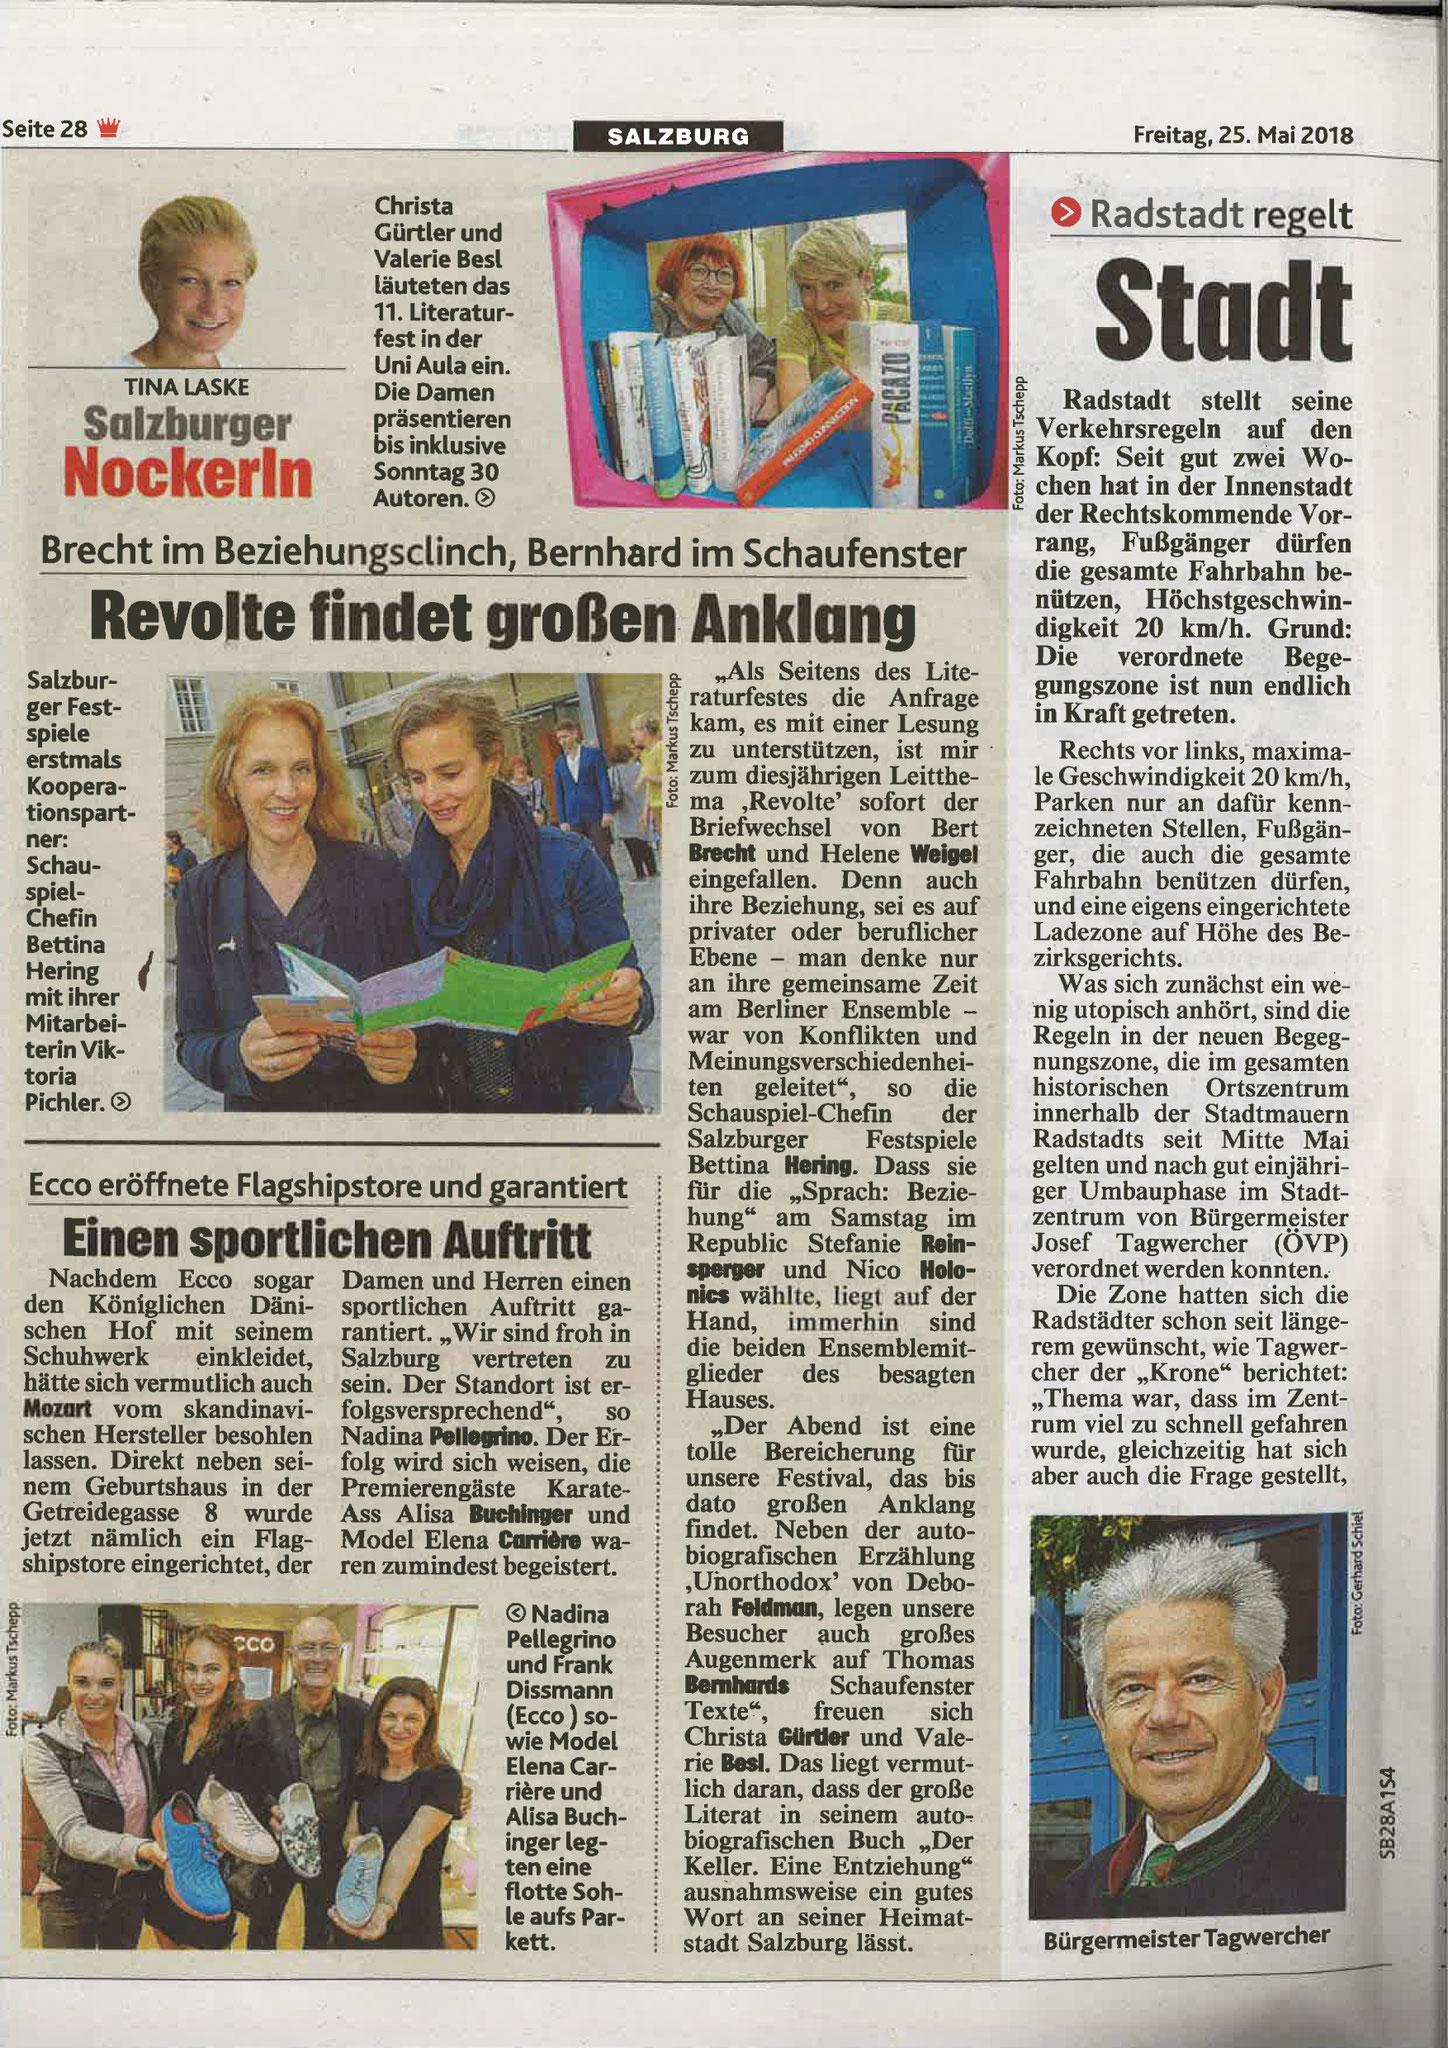 Kronen Zeitung, 25.05.2018